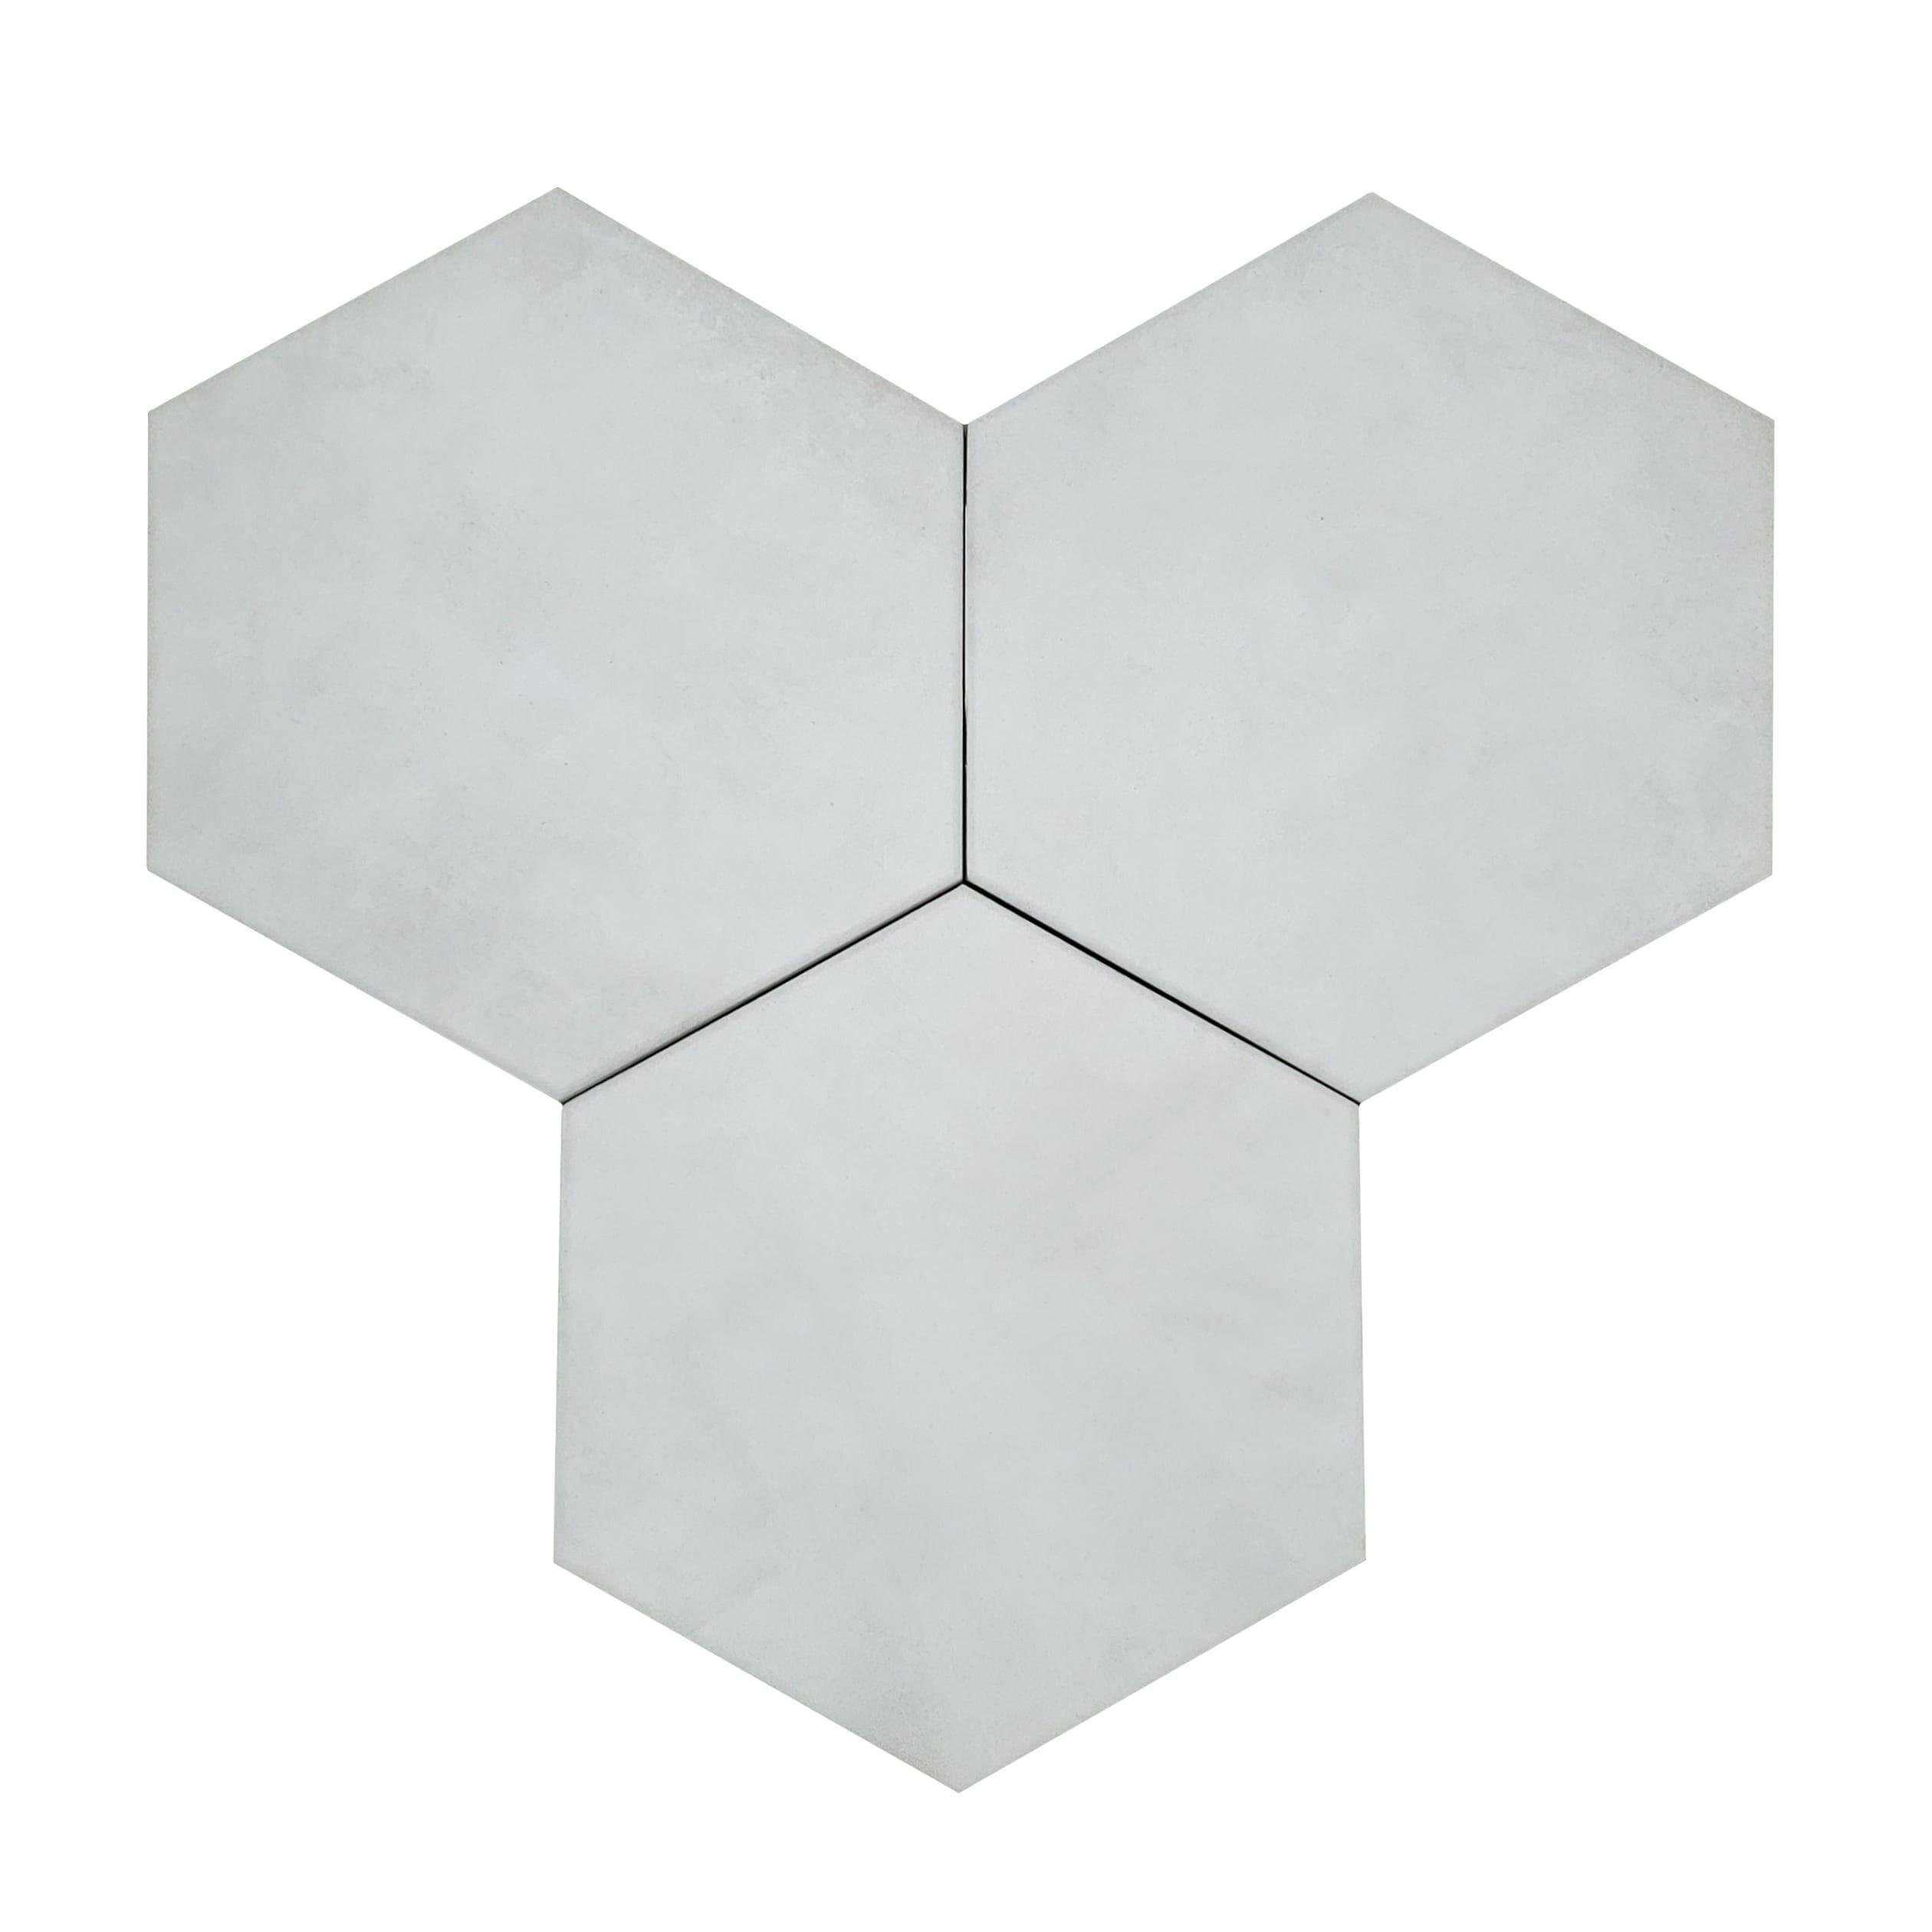 7×8 Form Hexagon Wall or Floor_Ivory-3.89v2